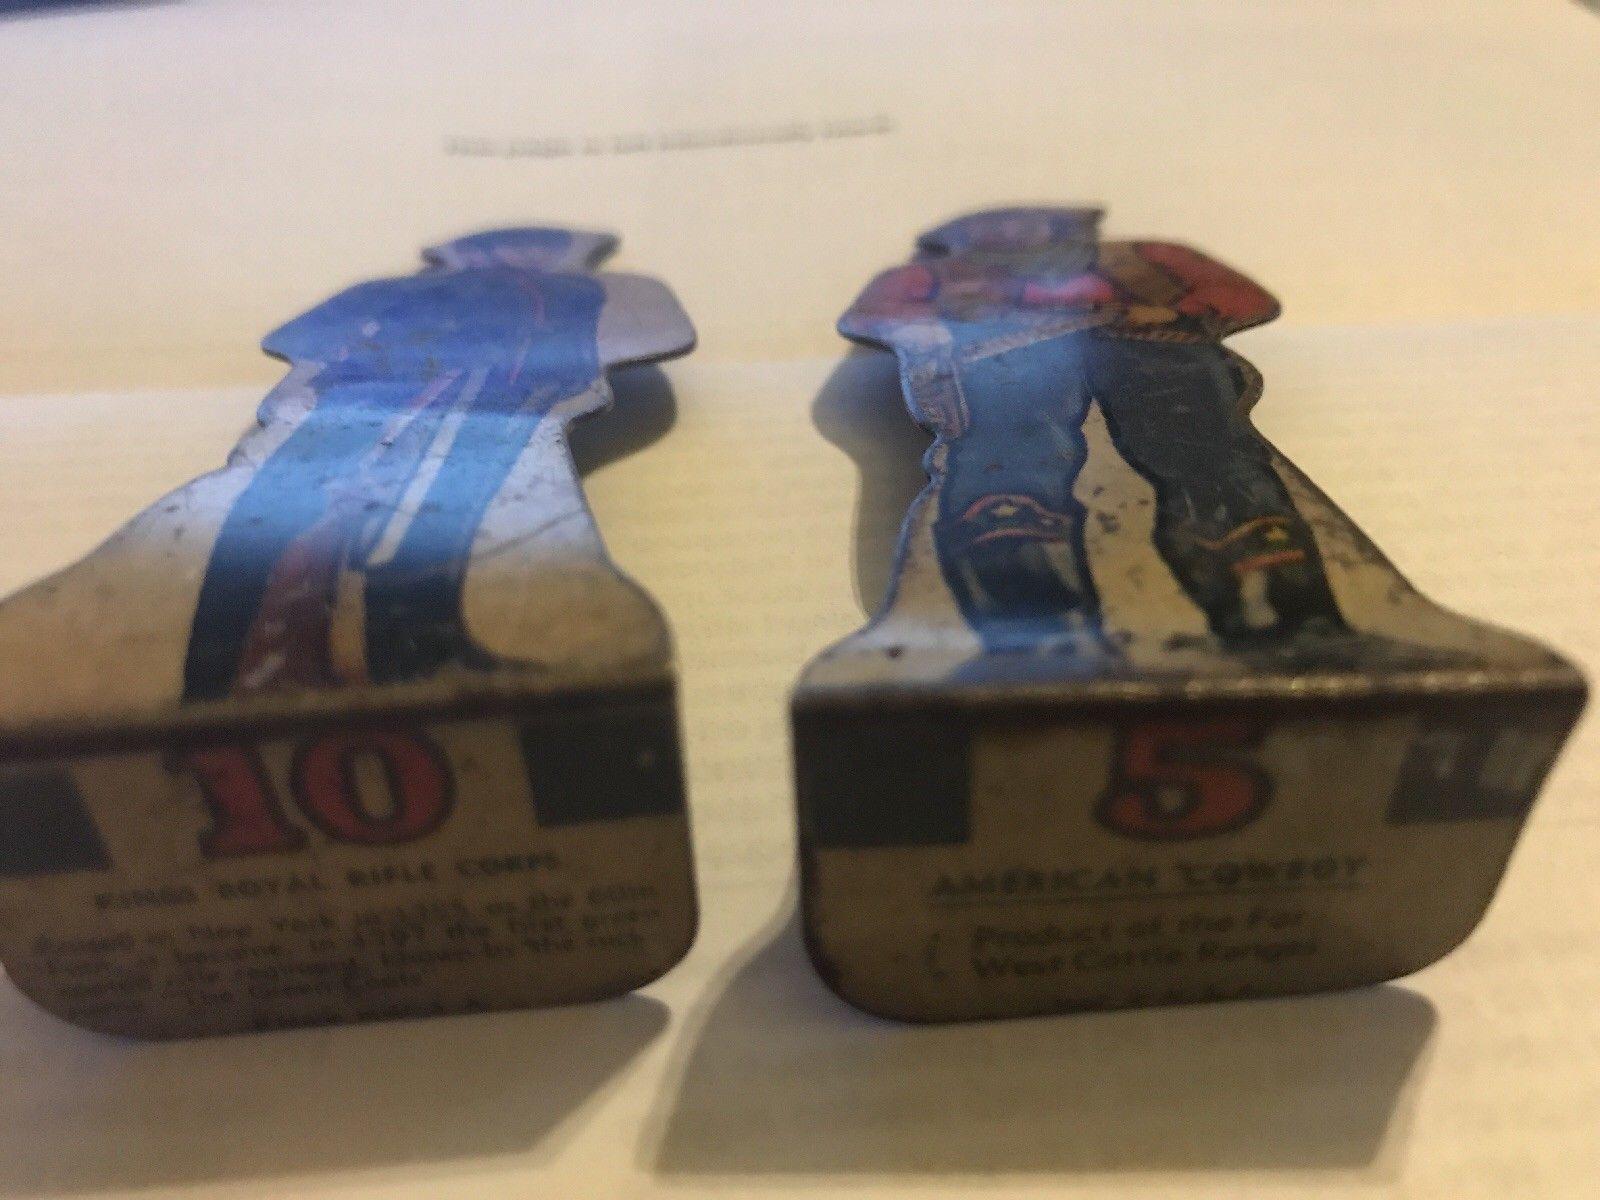 2 Vintage Tin Tinplate Lithograph Toys American Cowboy Kings Royal Rifle Corp